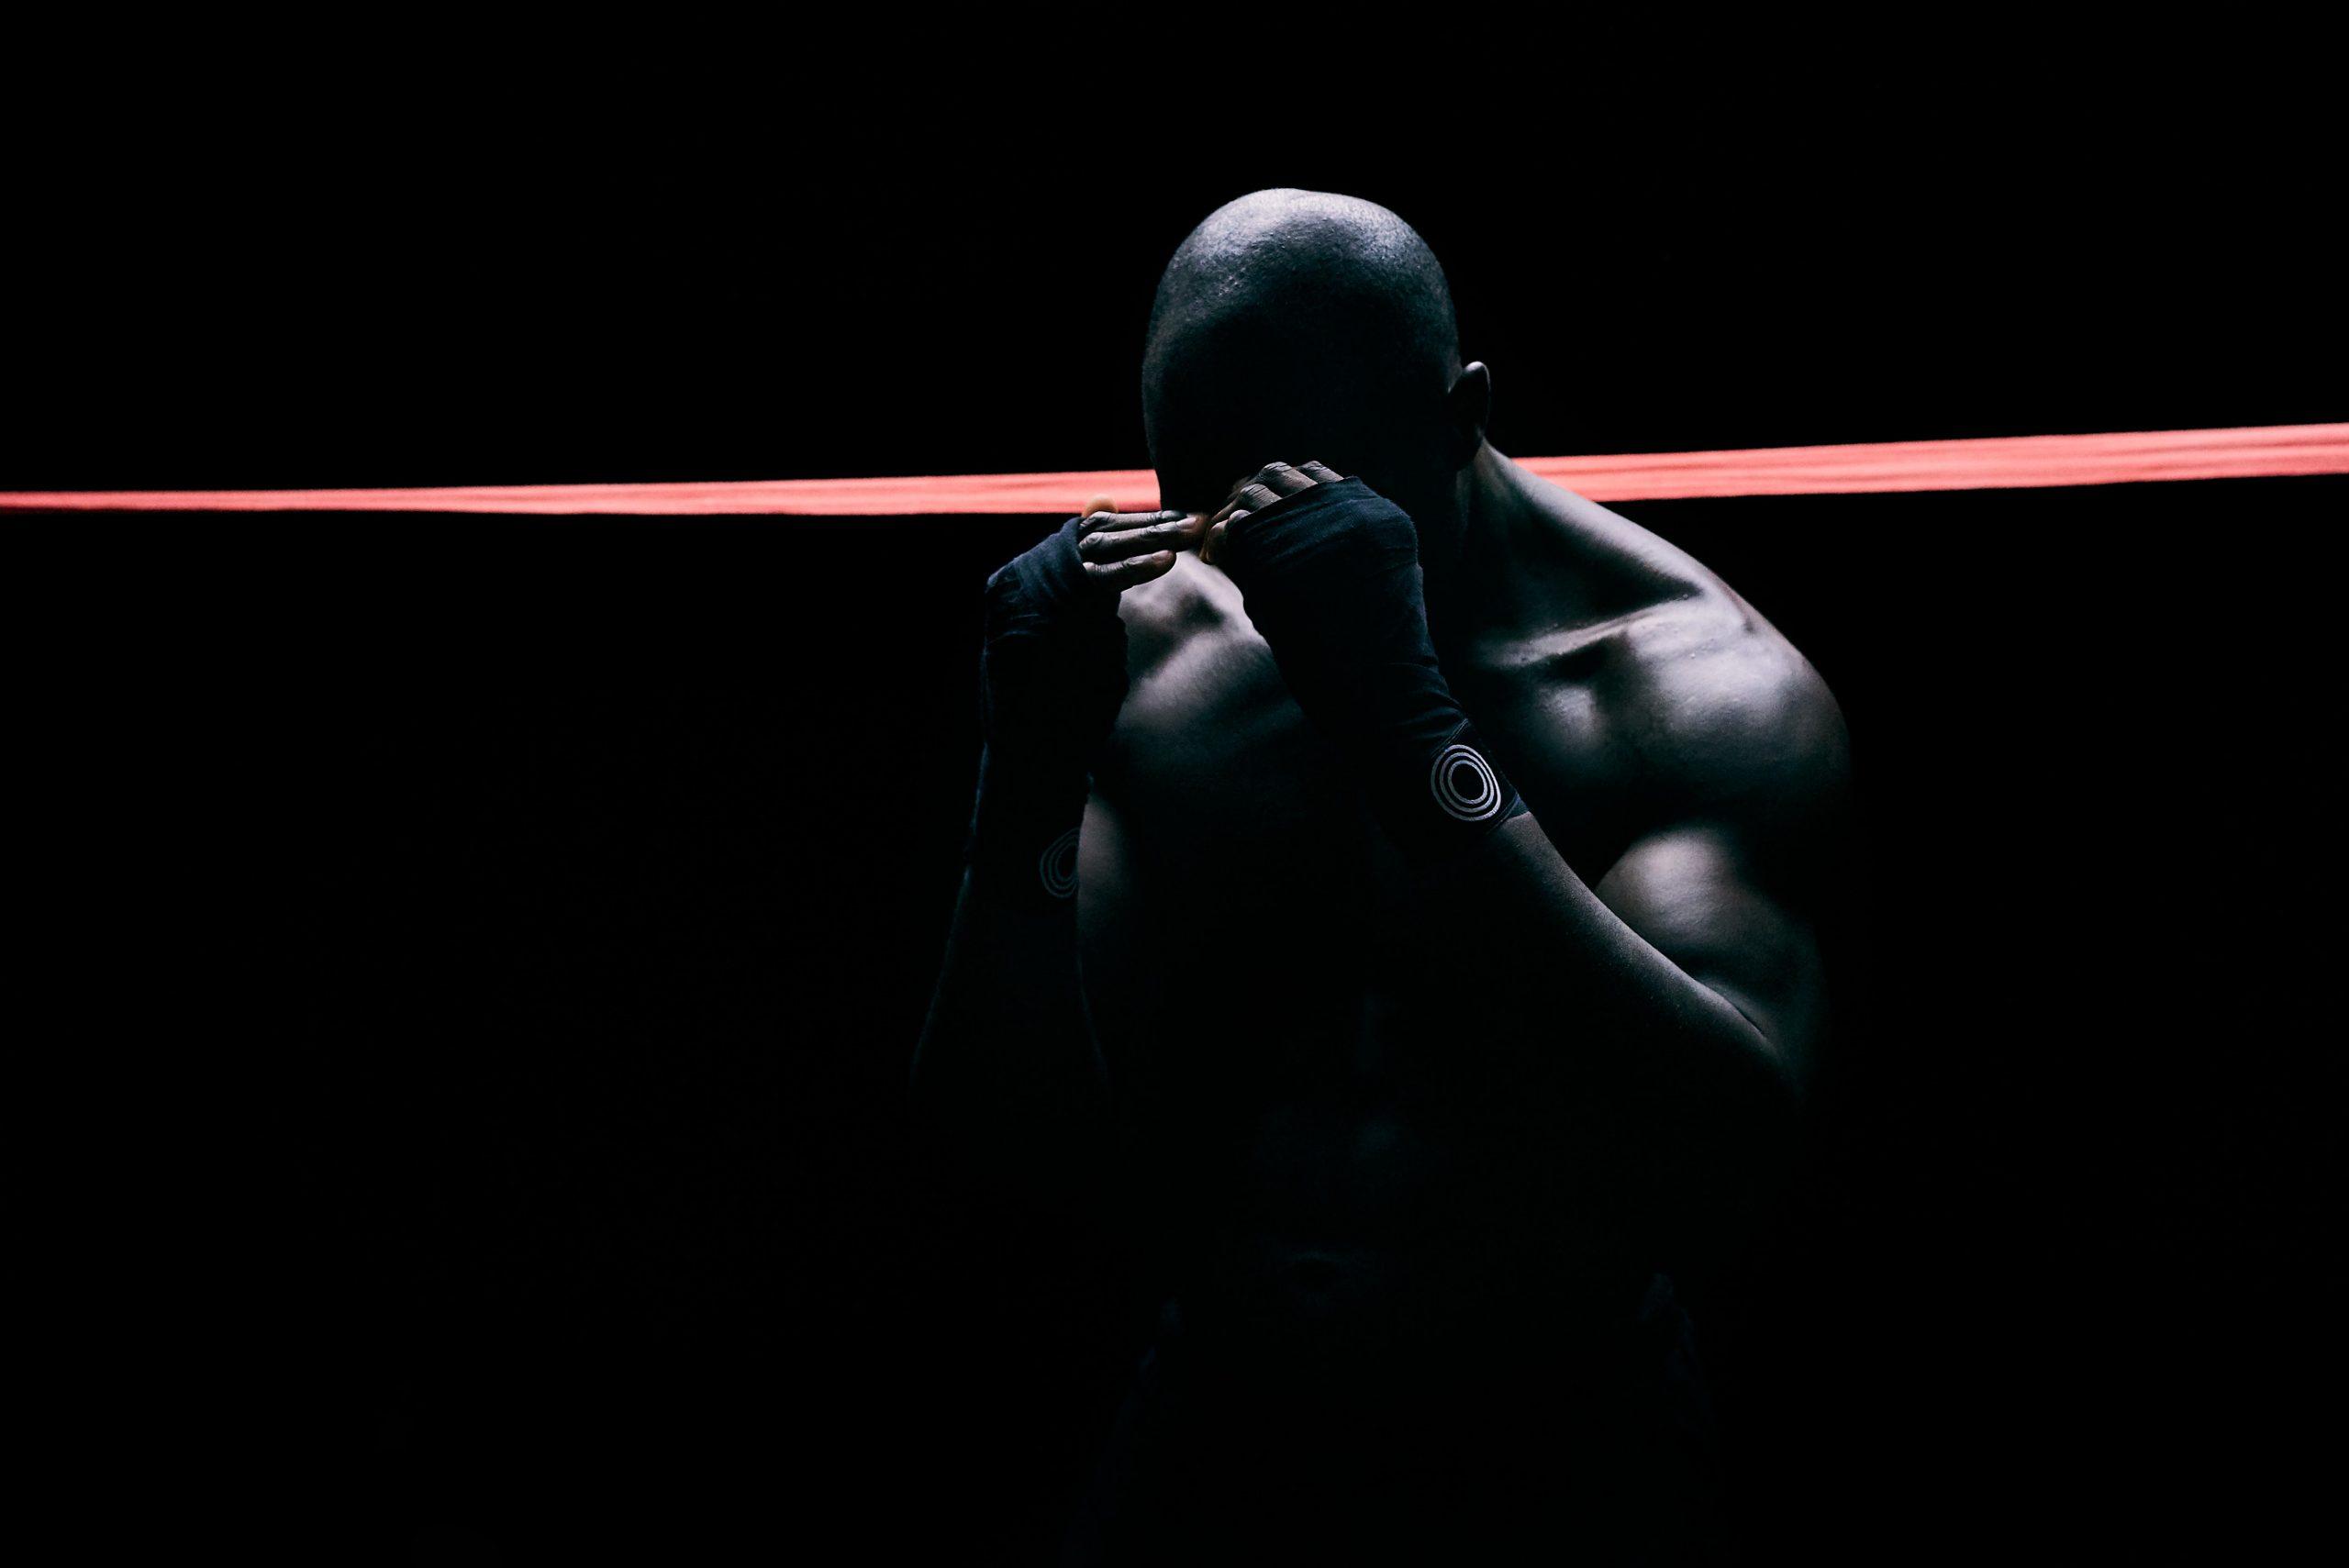 Stefano_Boxer-Video69404